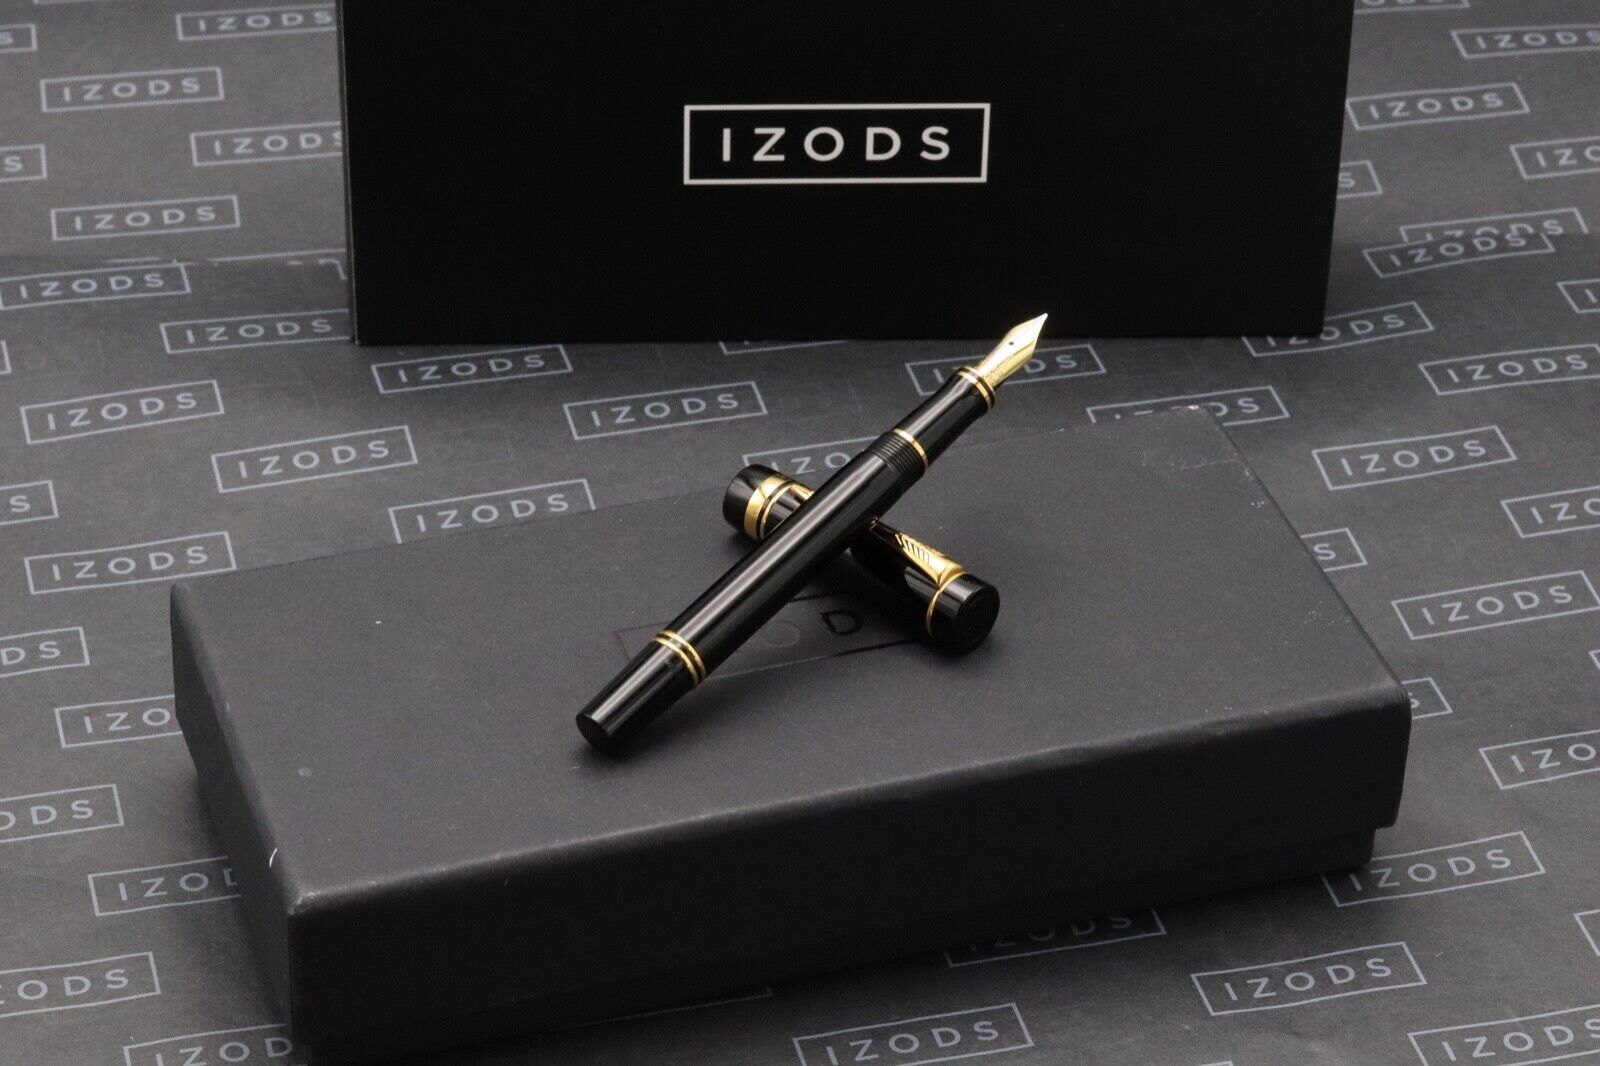 Parker Duofold International Black Fountain Pen - 1995 MK1